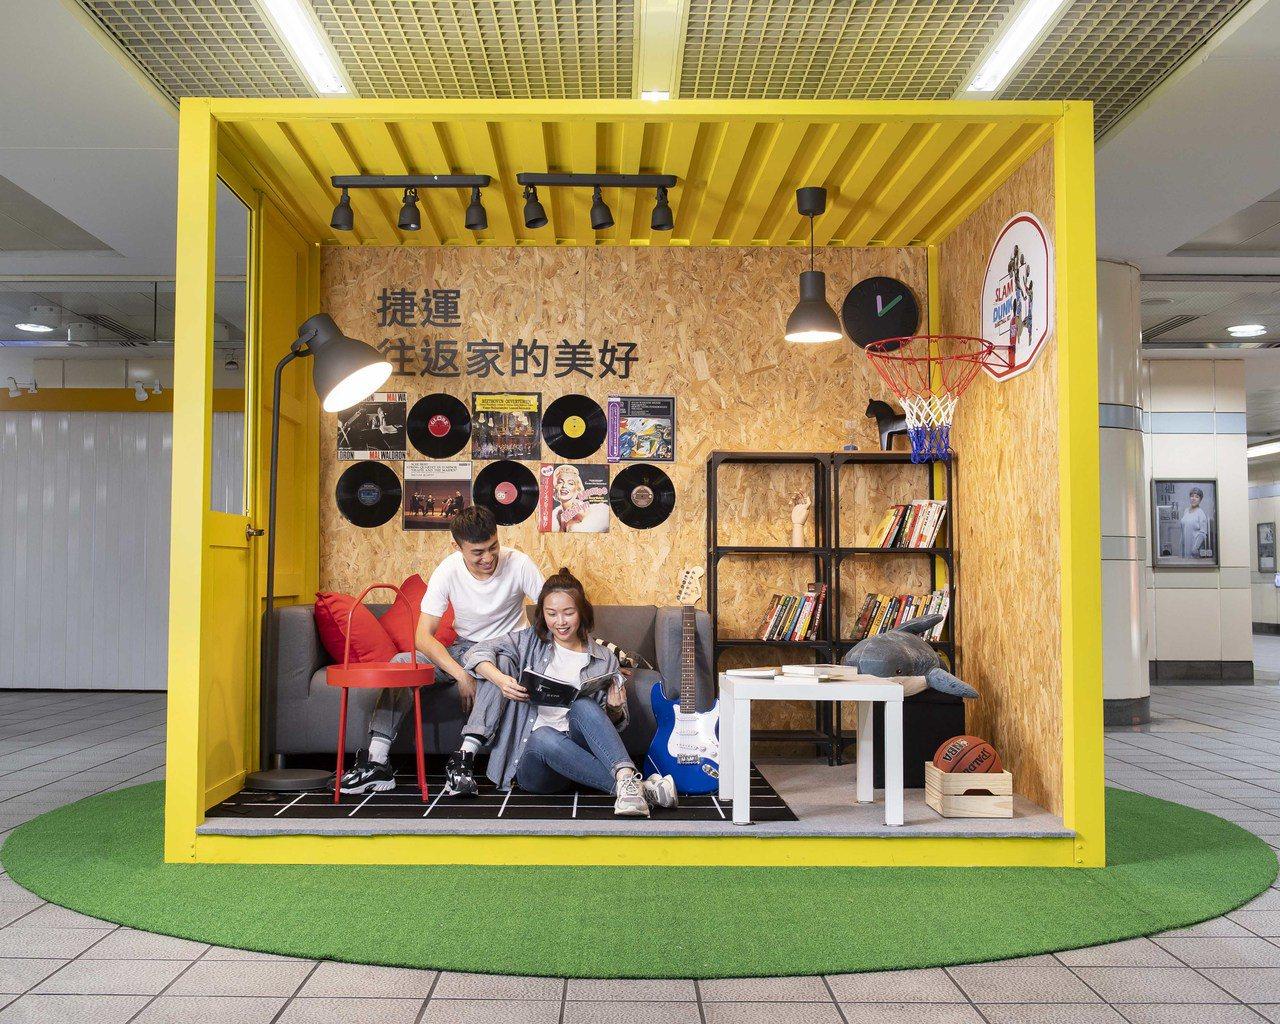 IKEA首度與台北捷運跨界合作改造捷運站,西門站以亮眼的黃色貨櫃配上個性家具家飾...